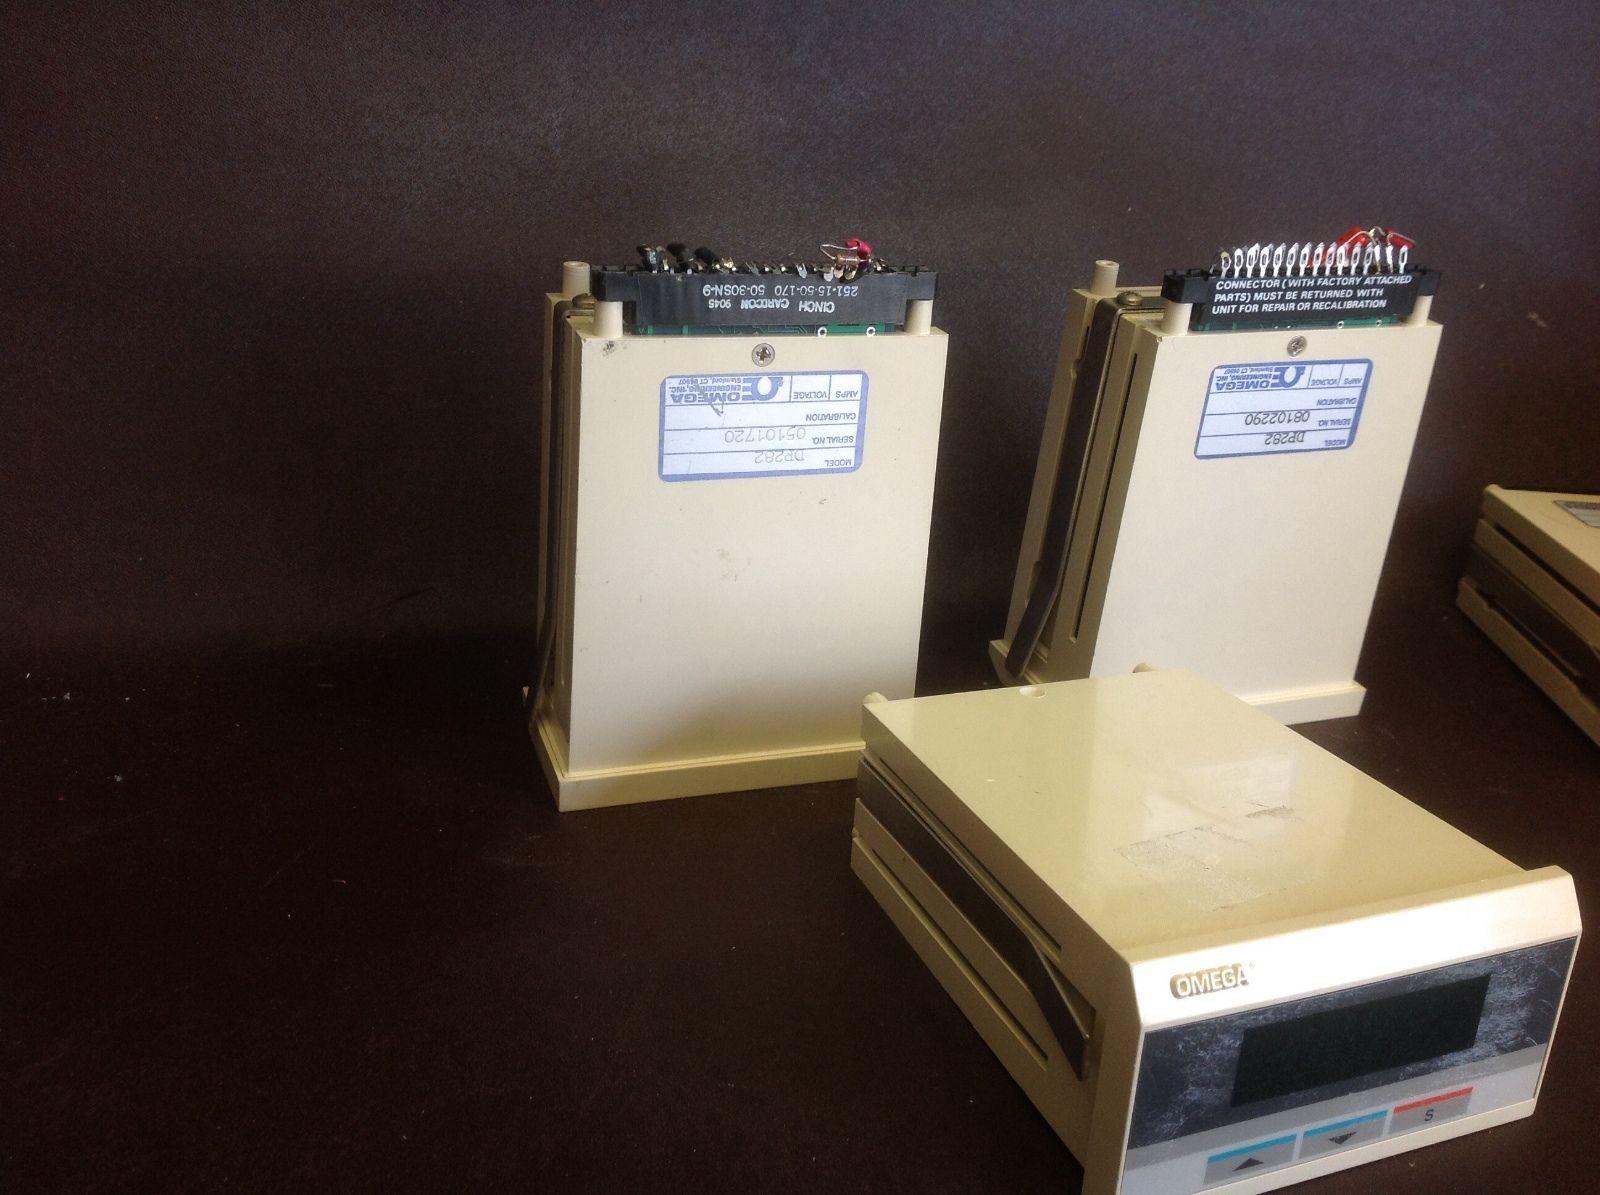 Omega Dp282 Temperature Controller Meter and 25 similar items